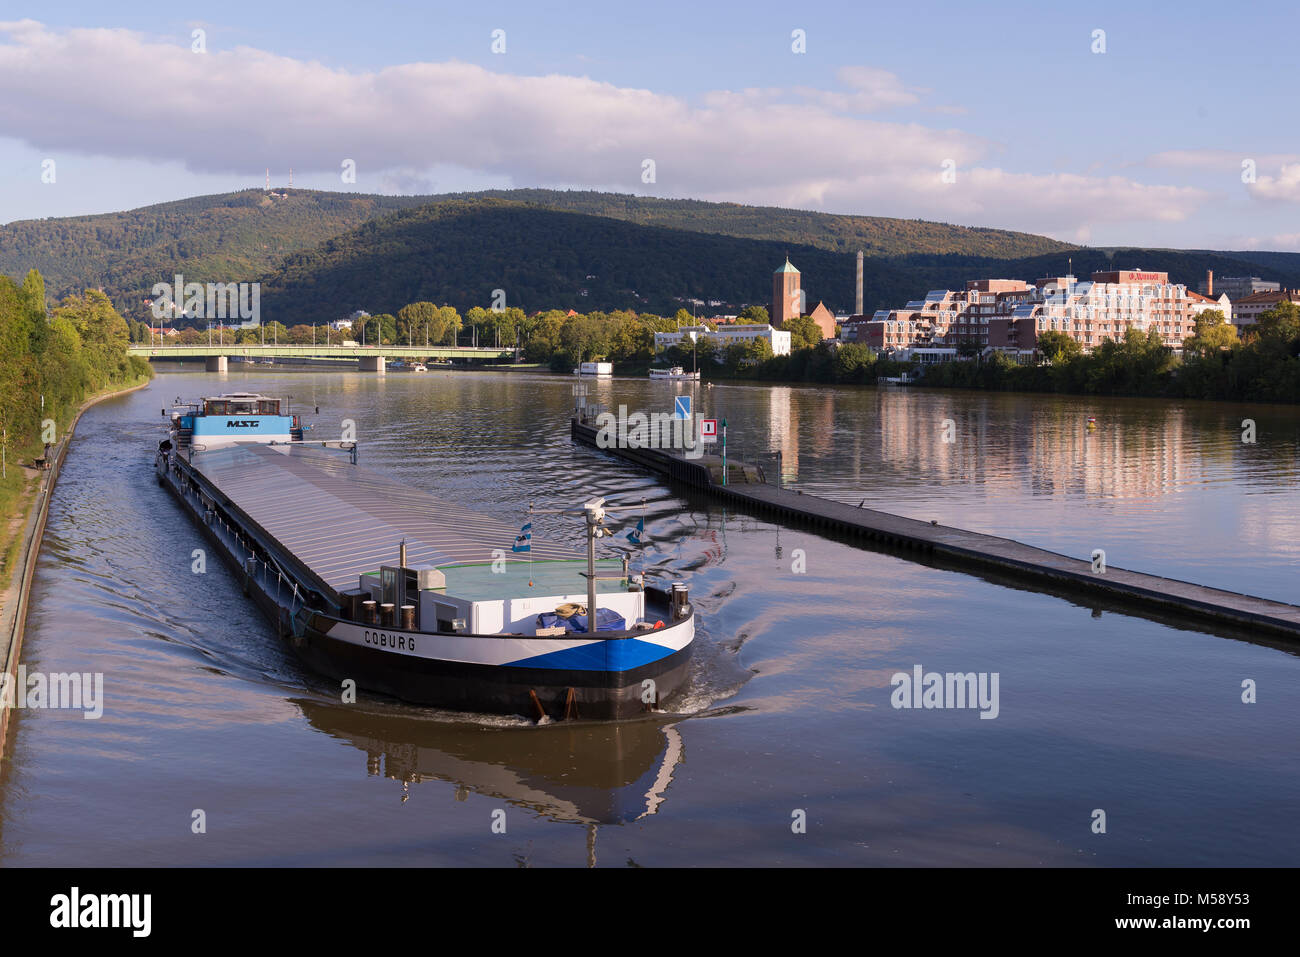 Stauwehr Wieblingen, Heidelberg, Baden-Württemberg, Deutschland, Europa - Stock Image